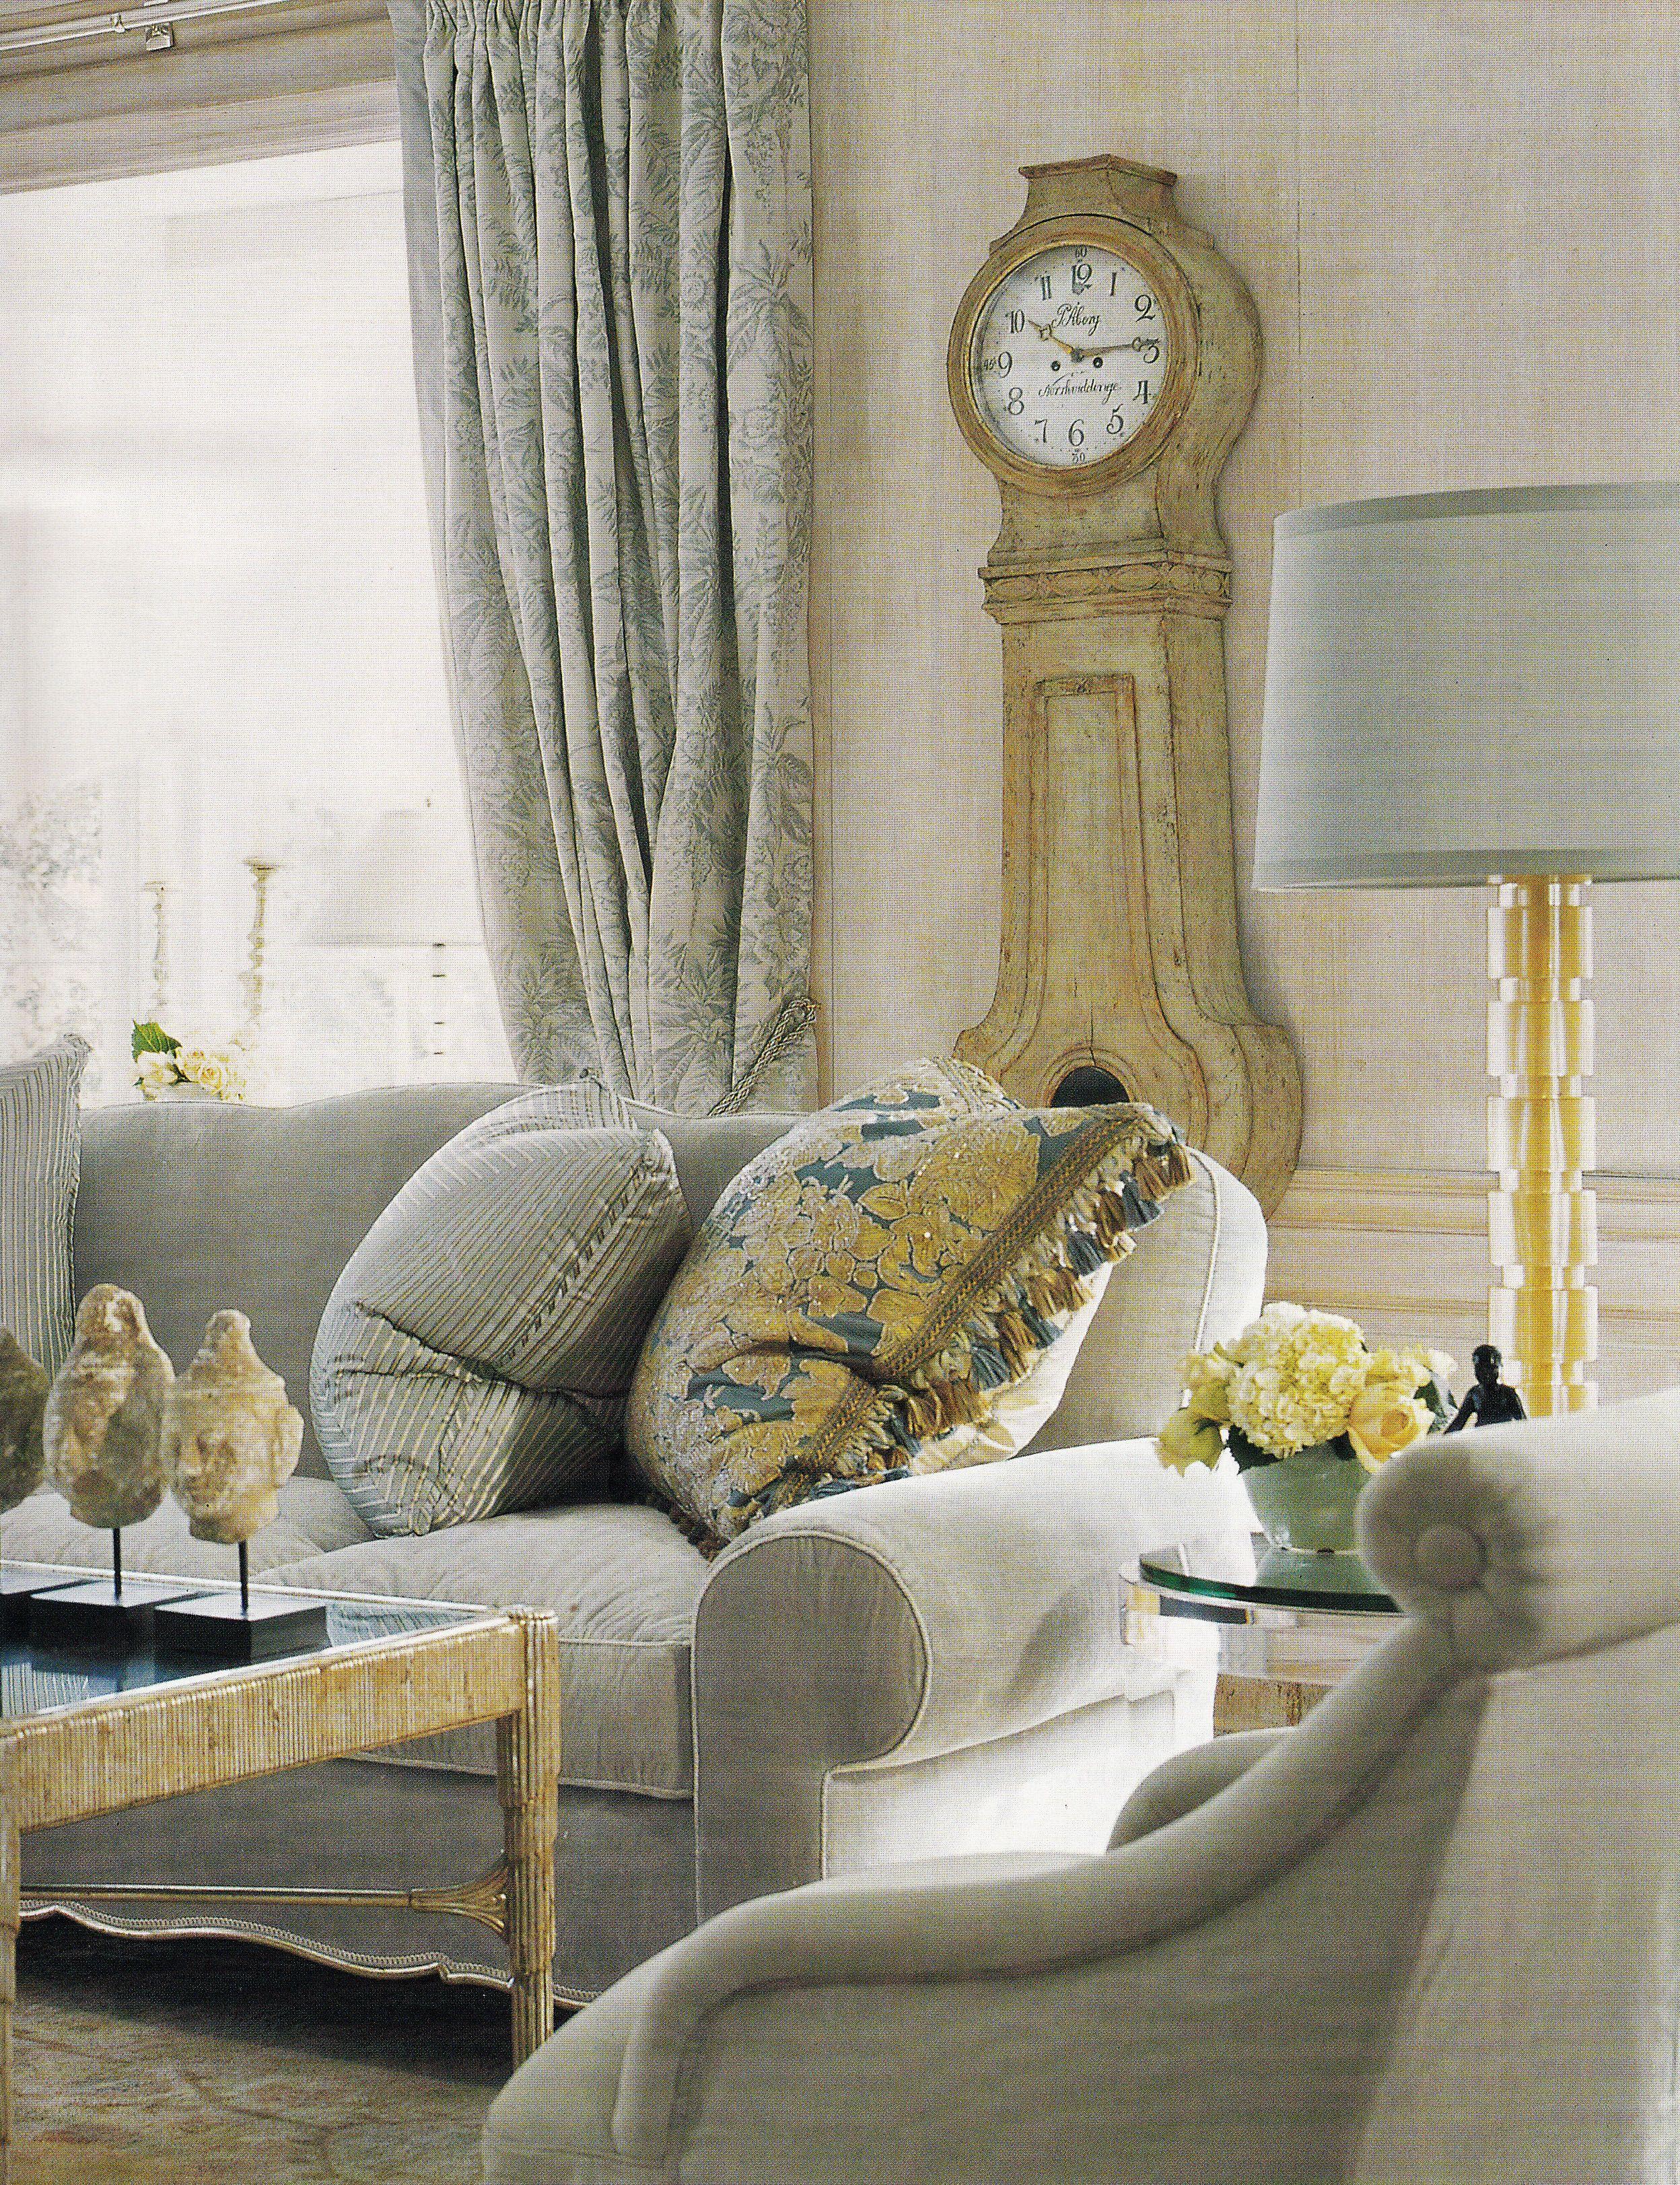 Living Room Showcase Design: Ann Norton House In West Palm Beach. Designers Showcase